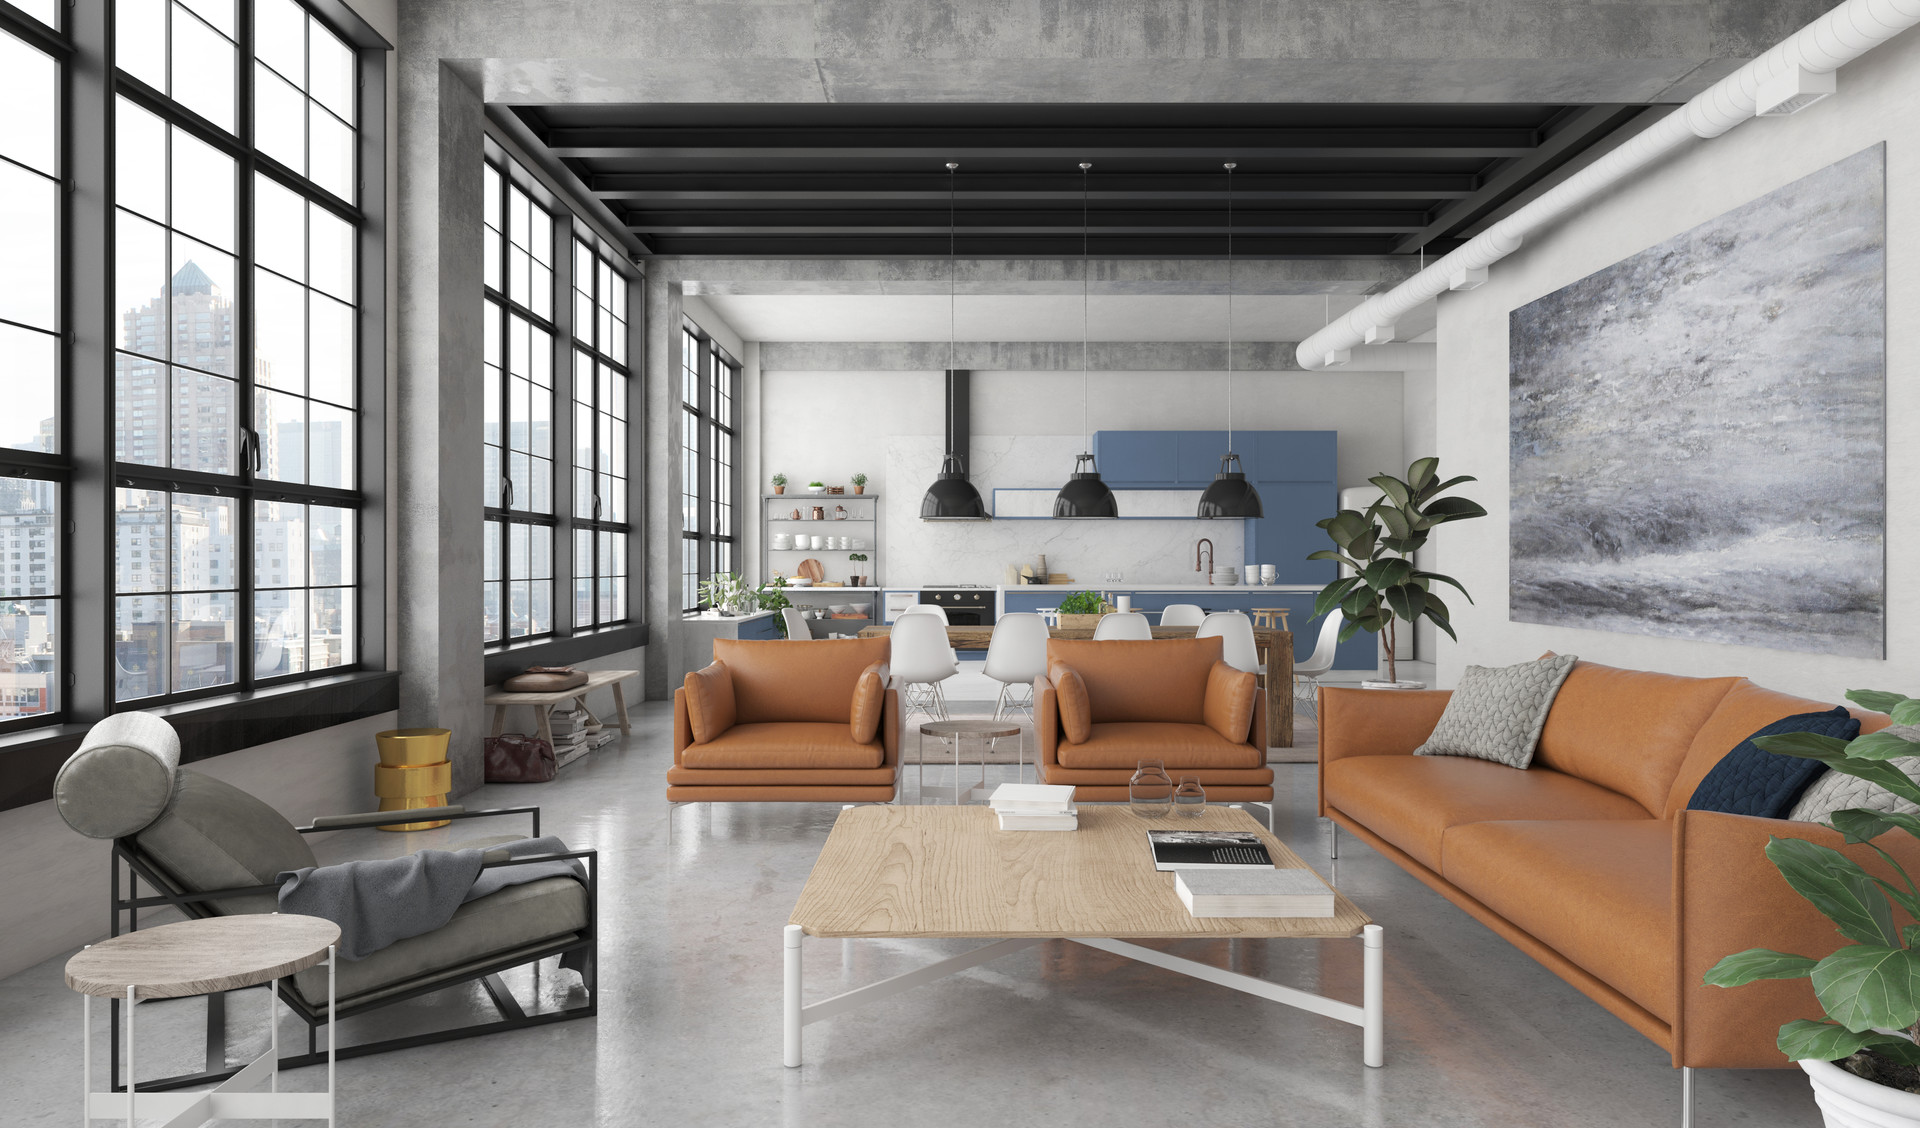 Artstation - Industrial Loft Style Javier Wainstein